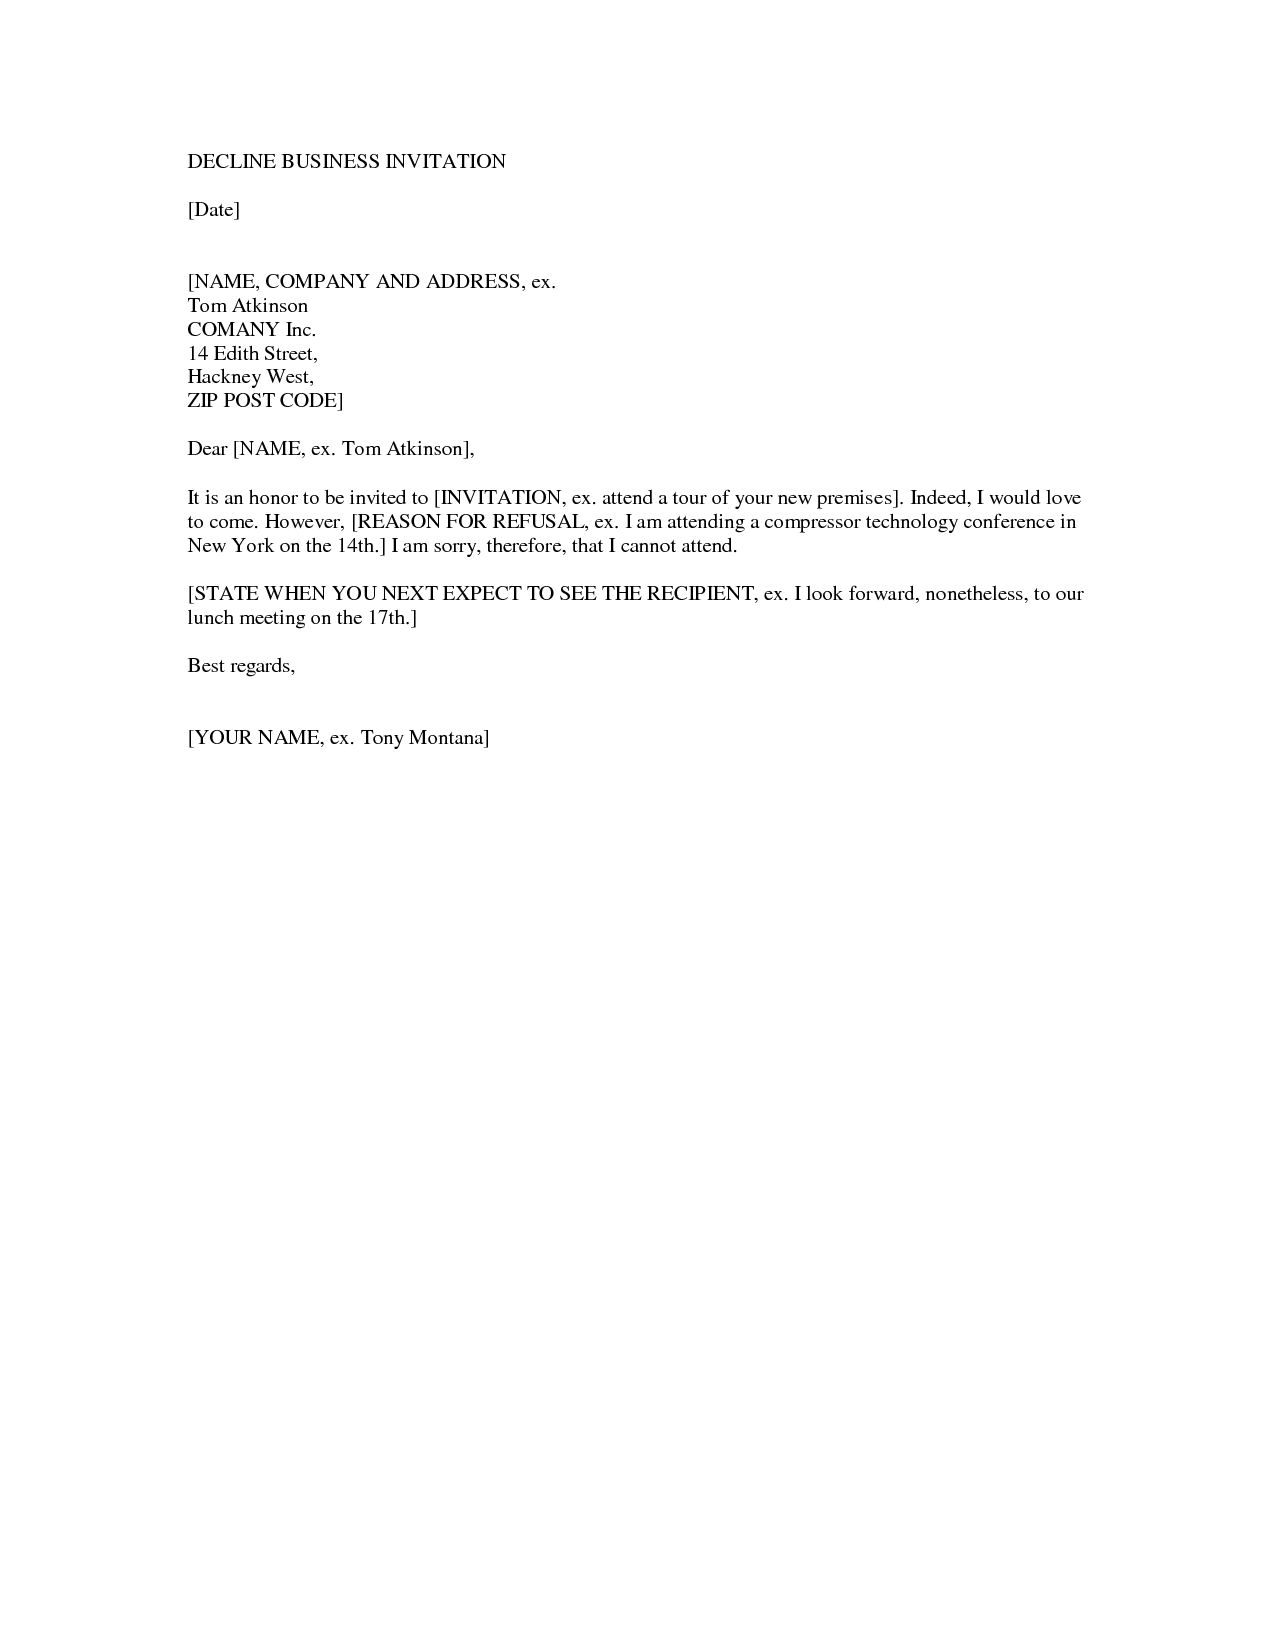 decline wedding invitation sample